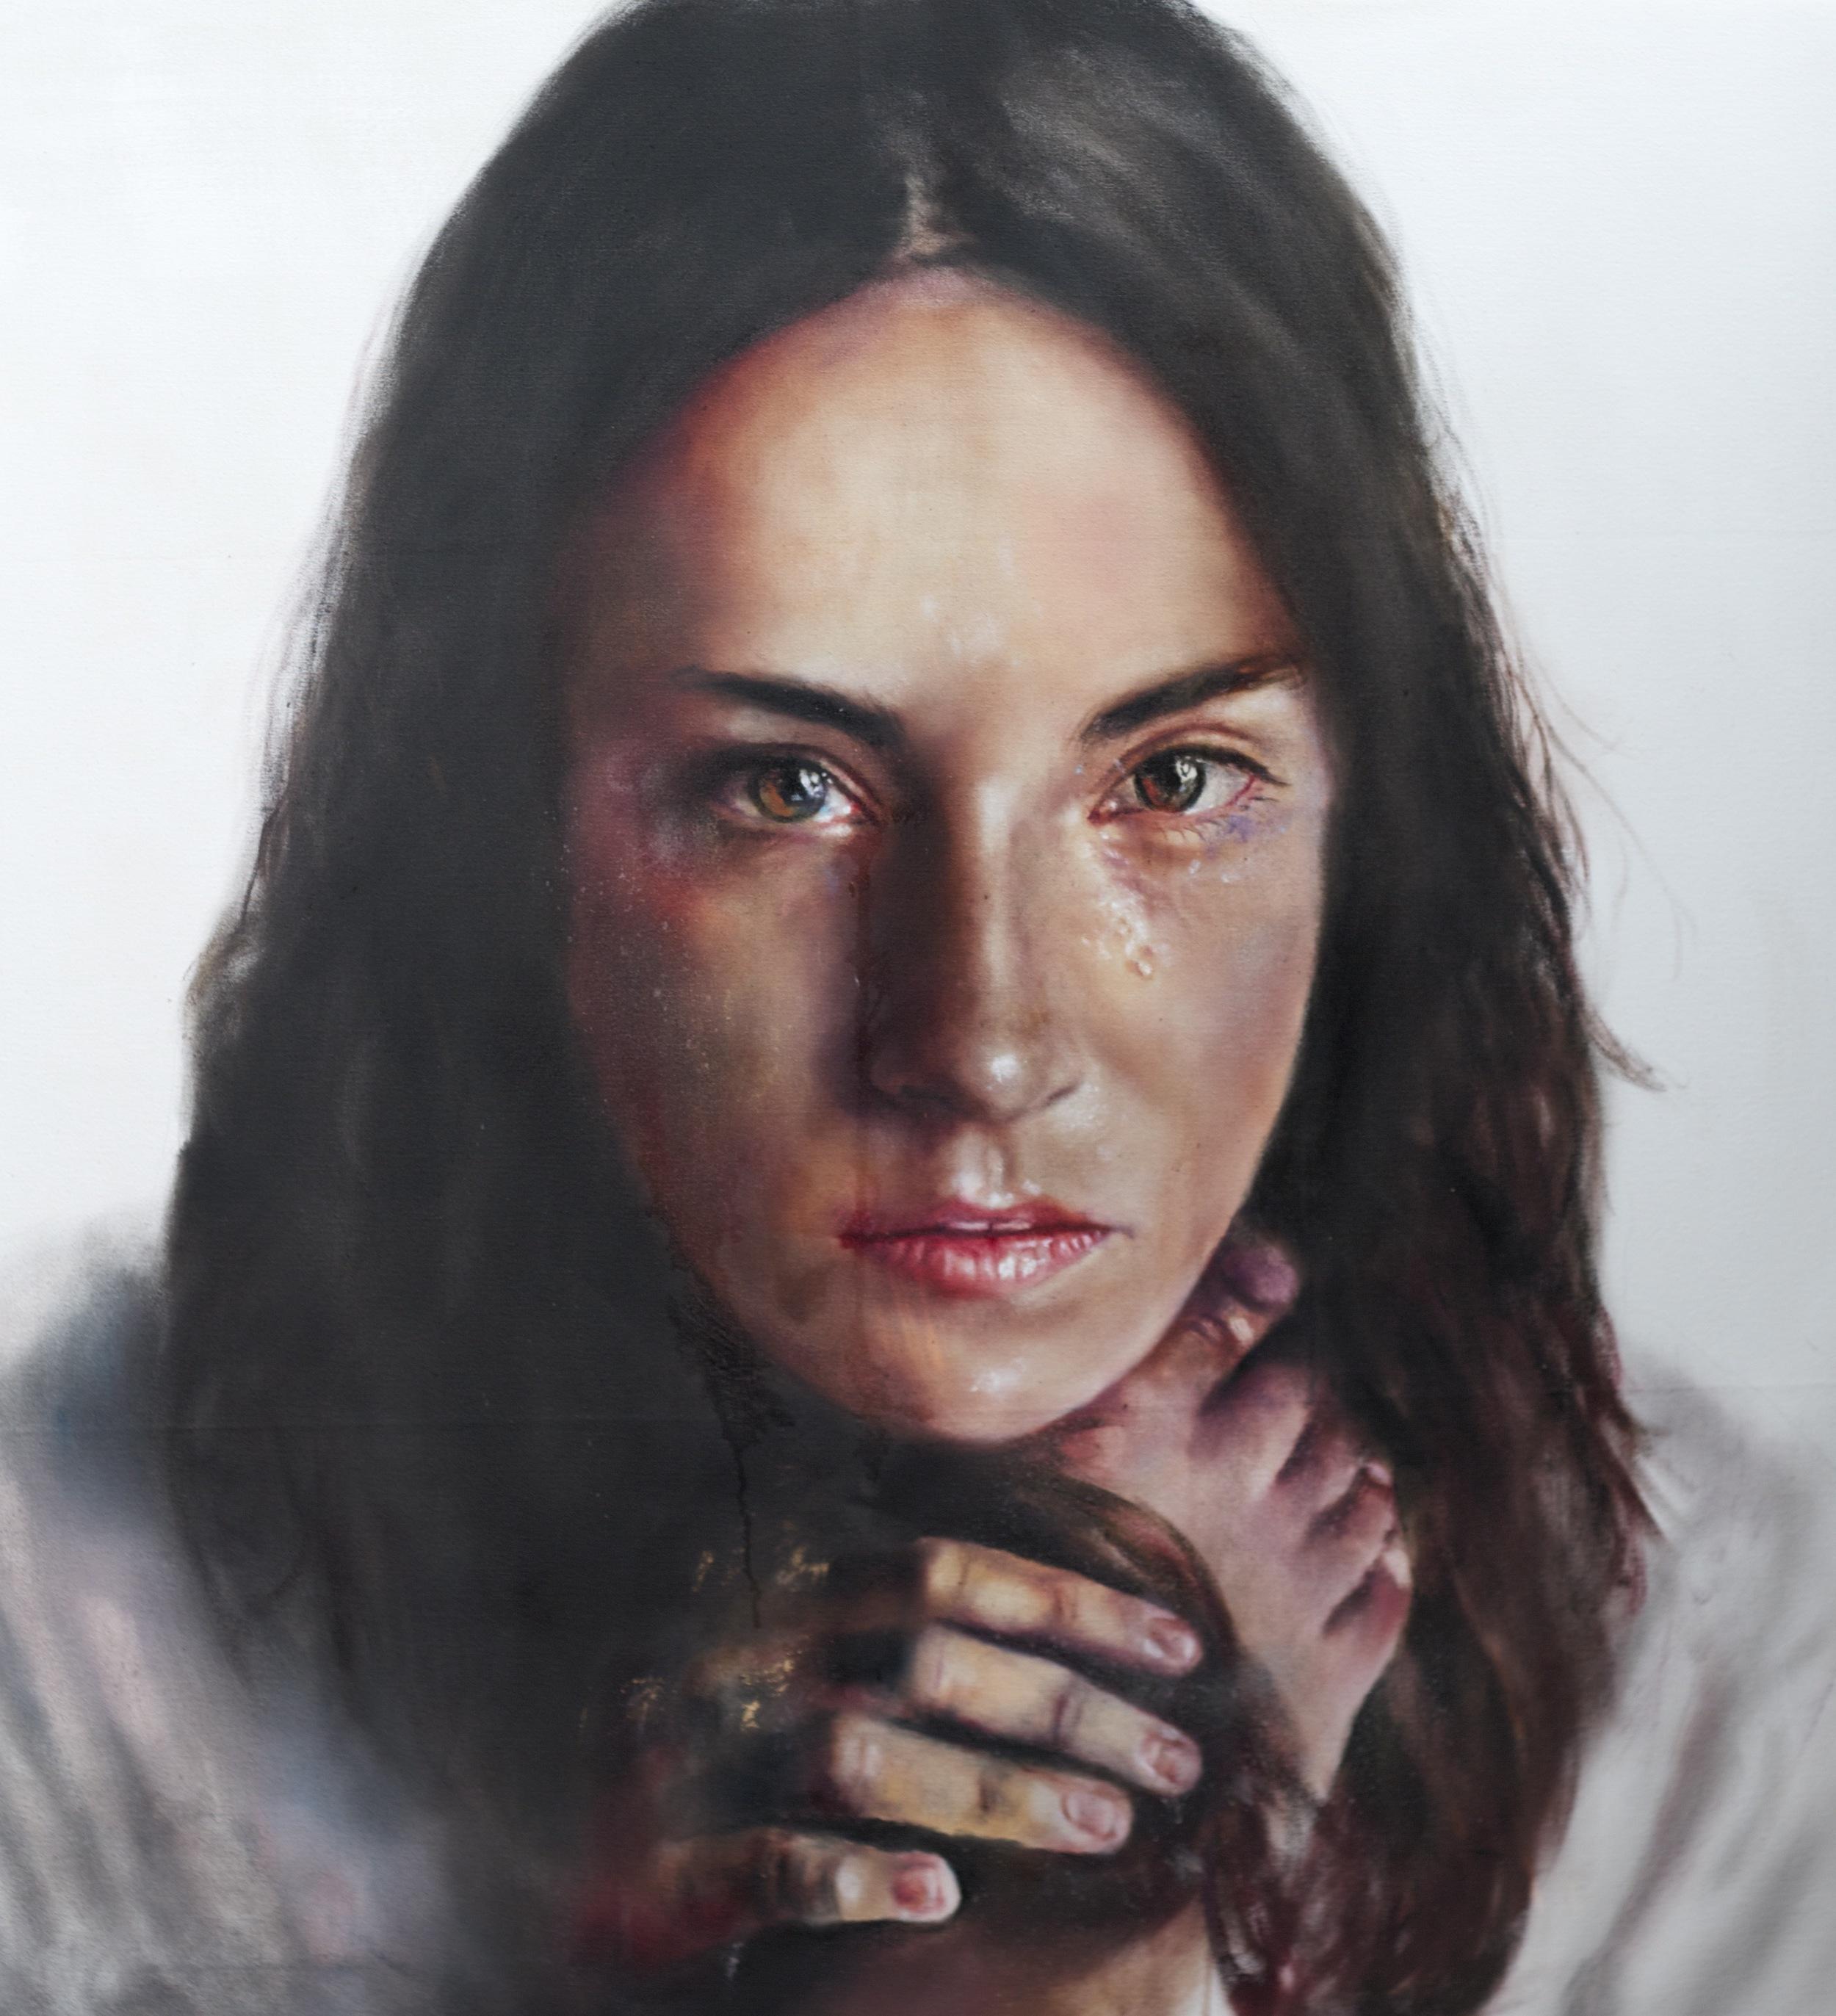 Alabaster Woman Giclée Print - from $144.00